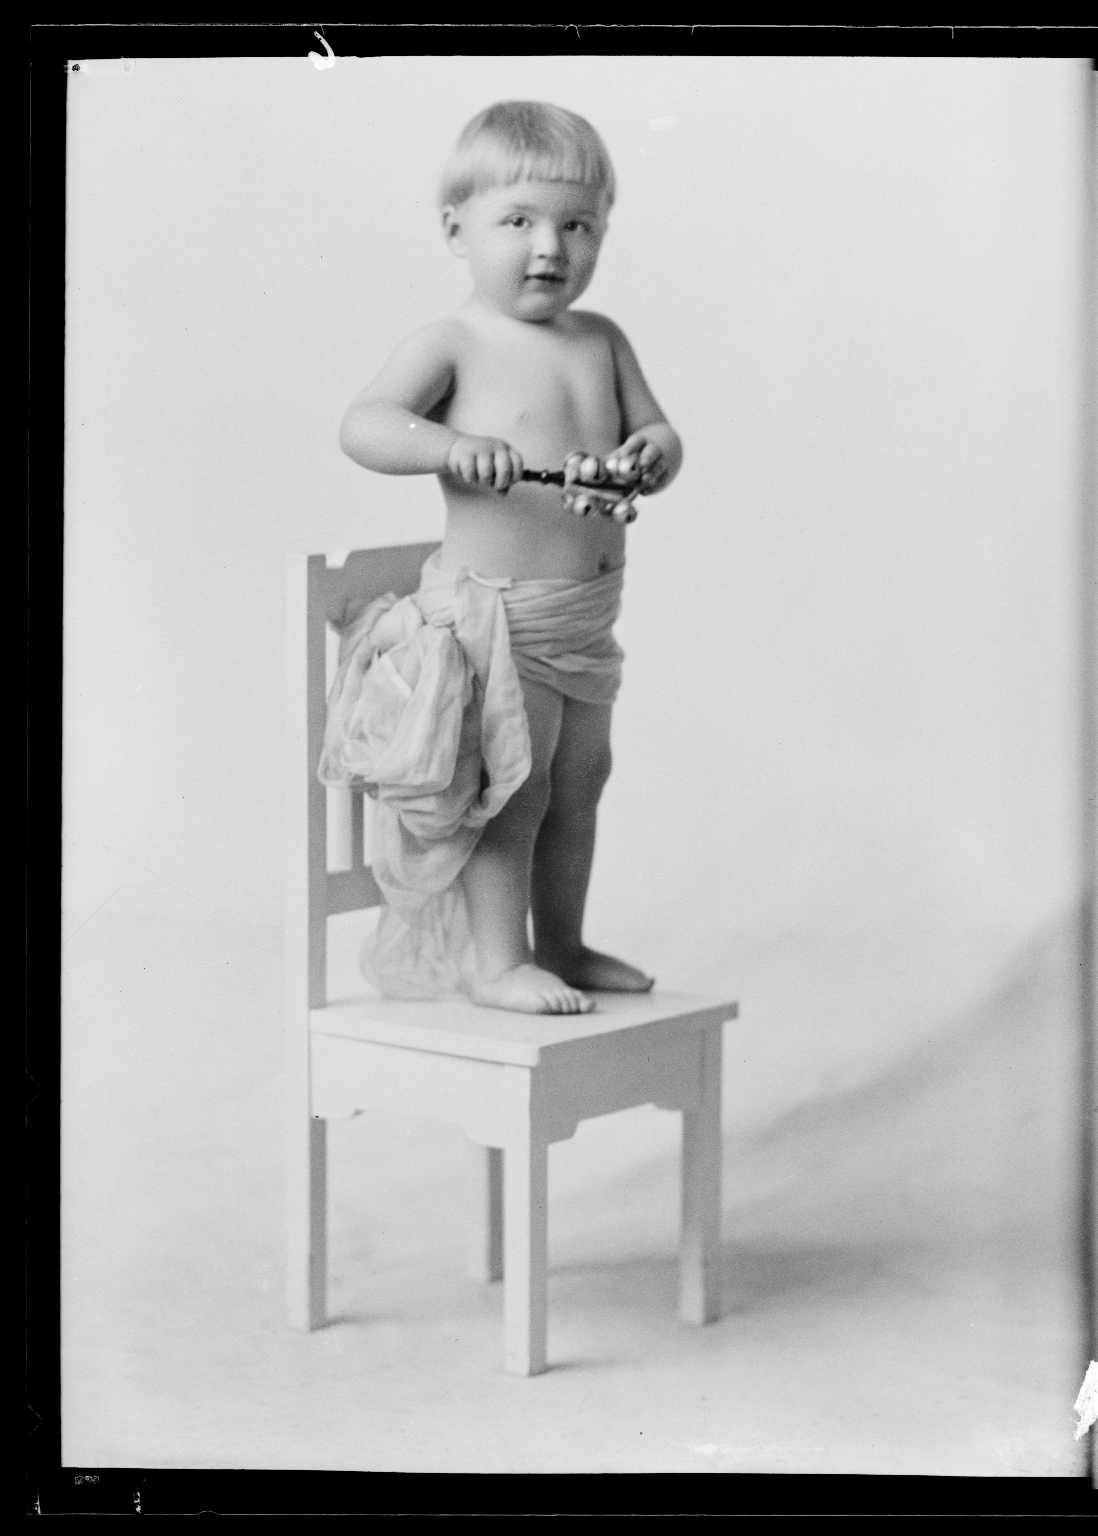 Portraits of child of William Neiheisal